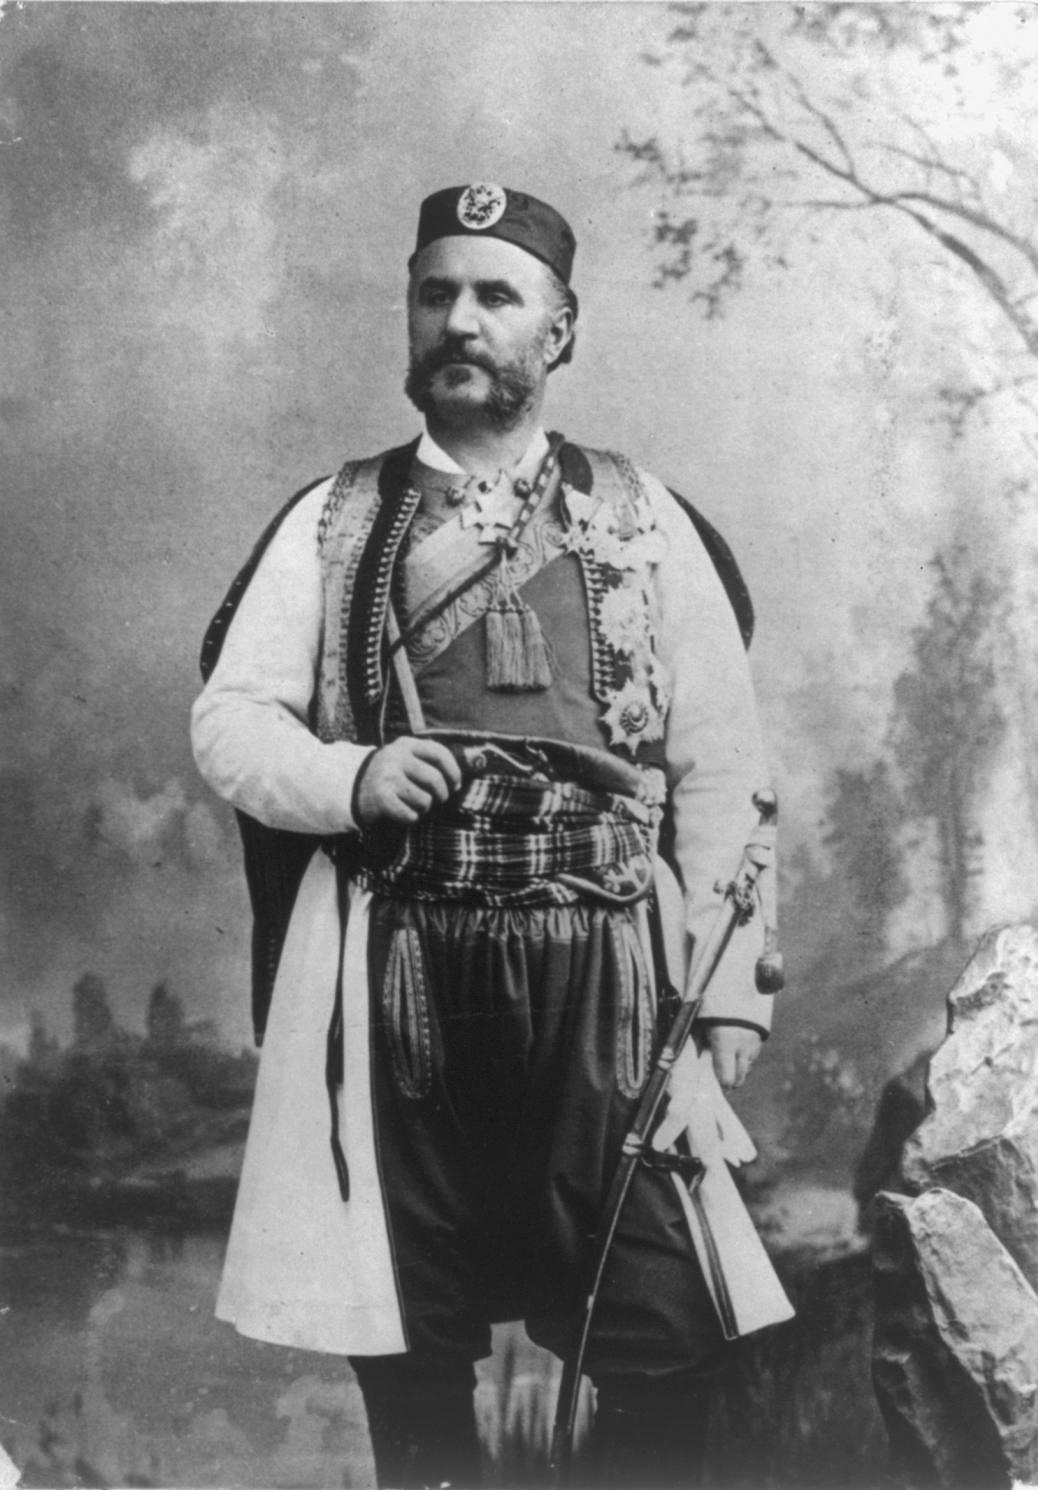 Nicholas I of Montenegro rulers